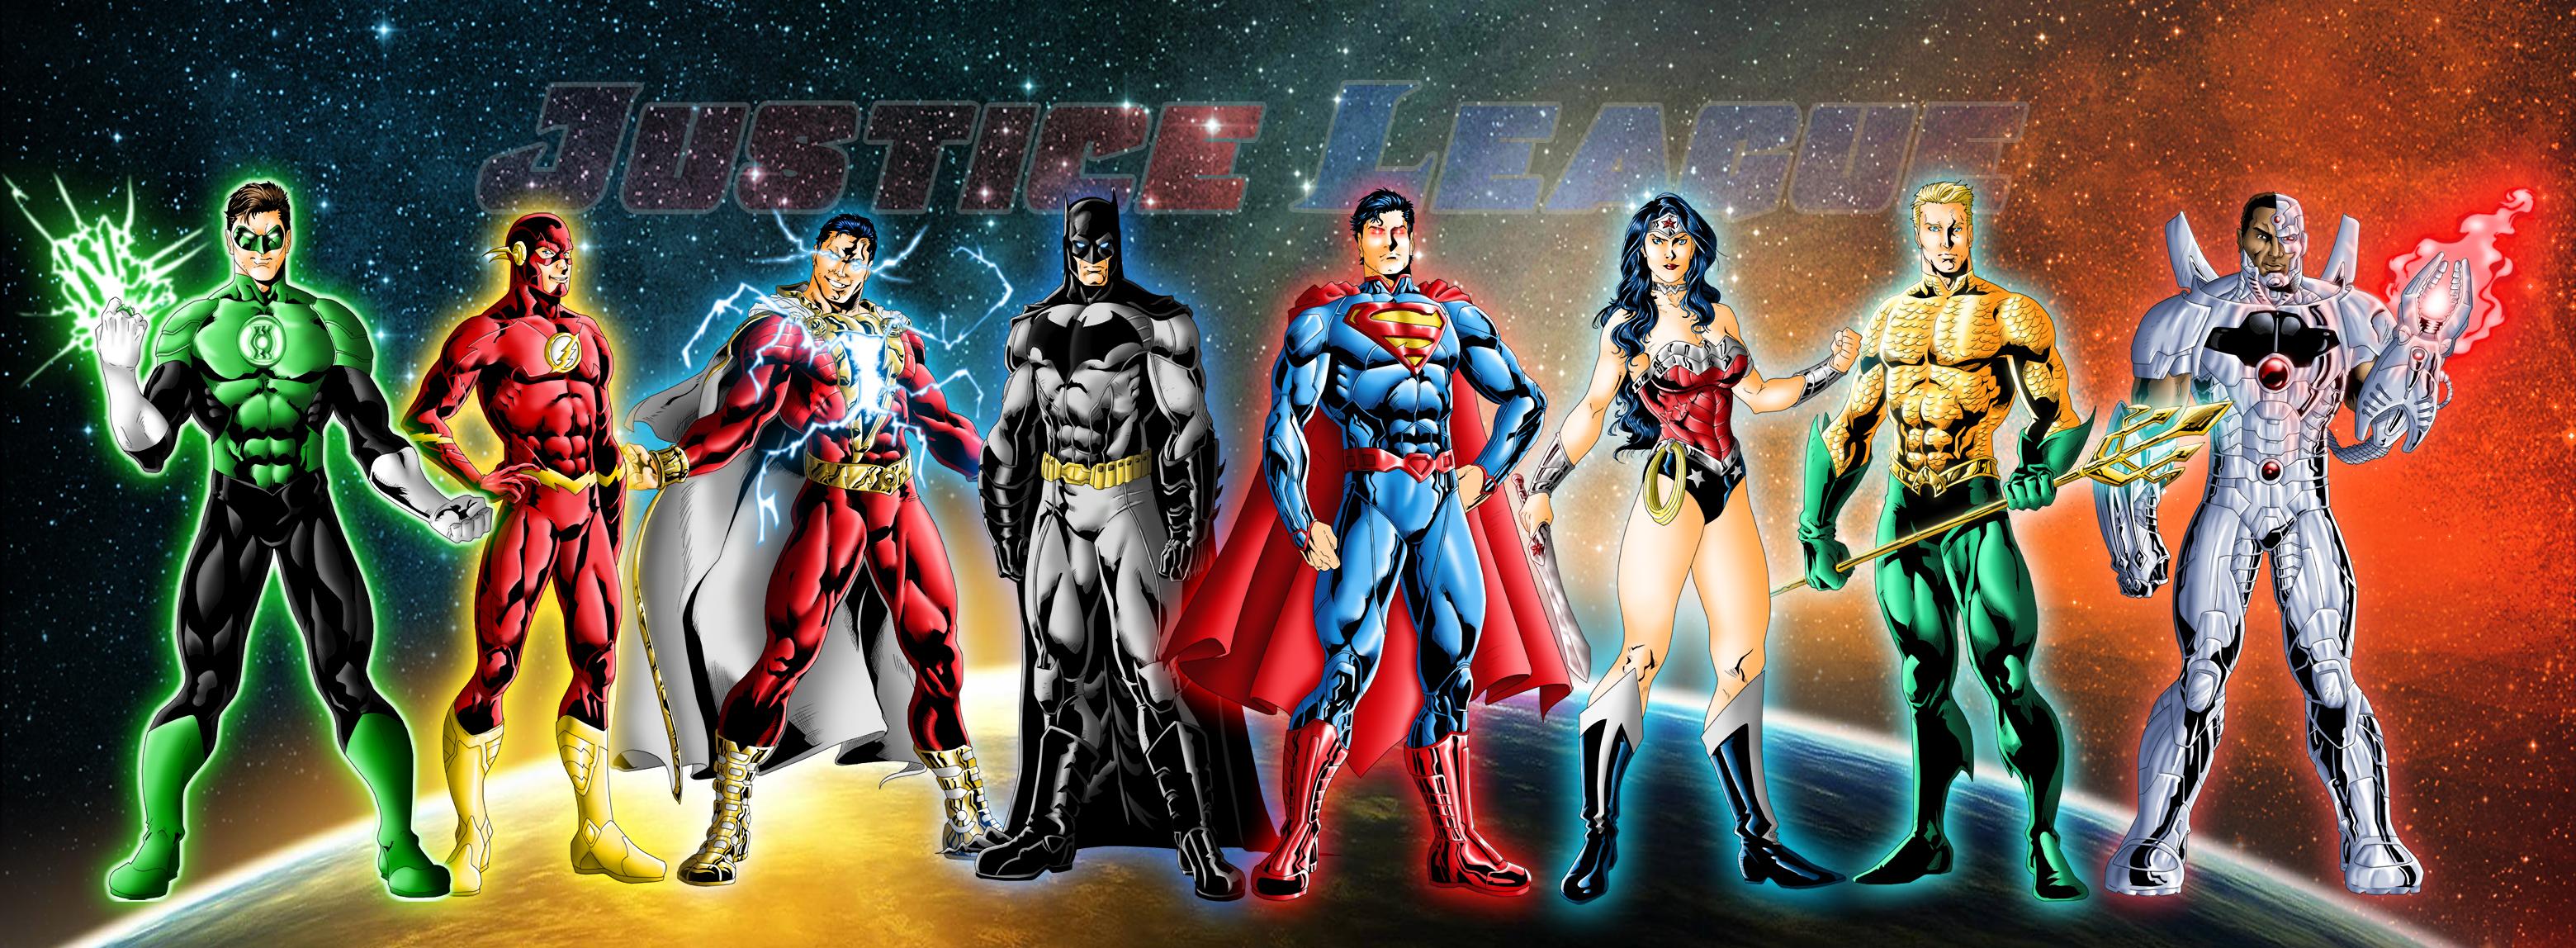 Wonder Woman Wallpapers ID435527